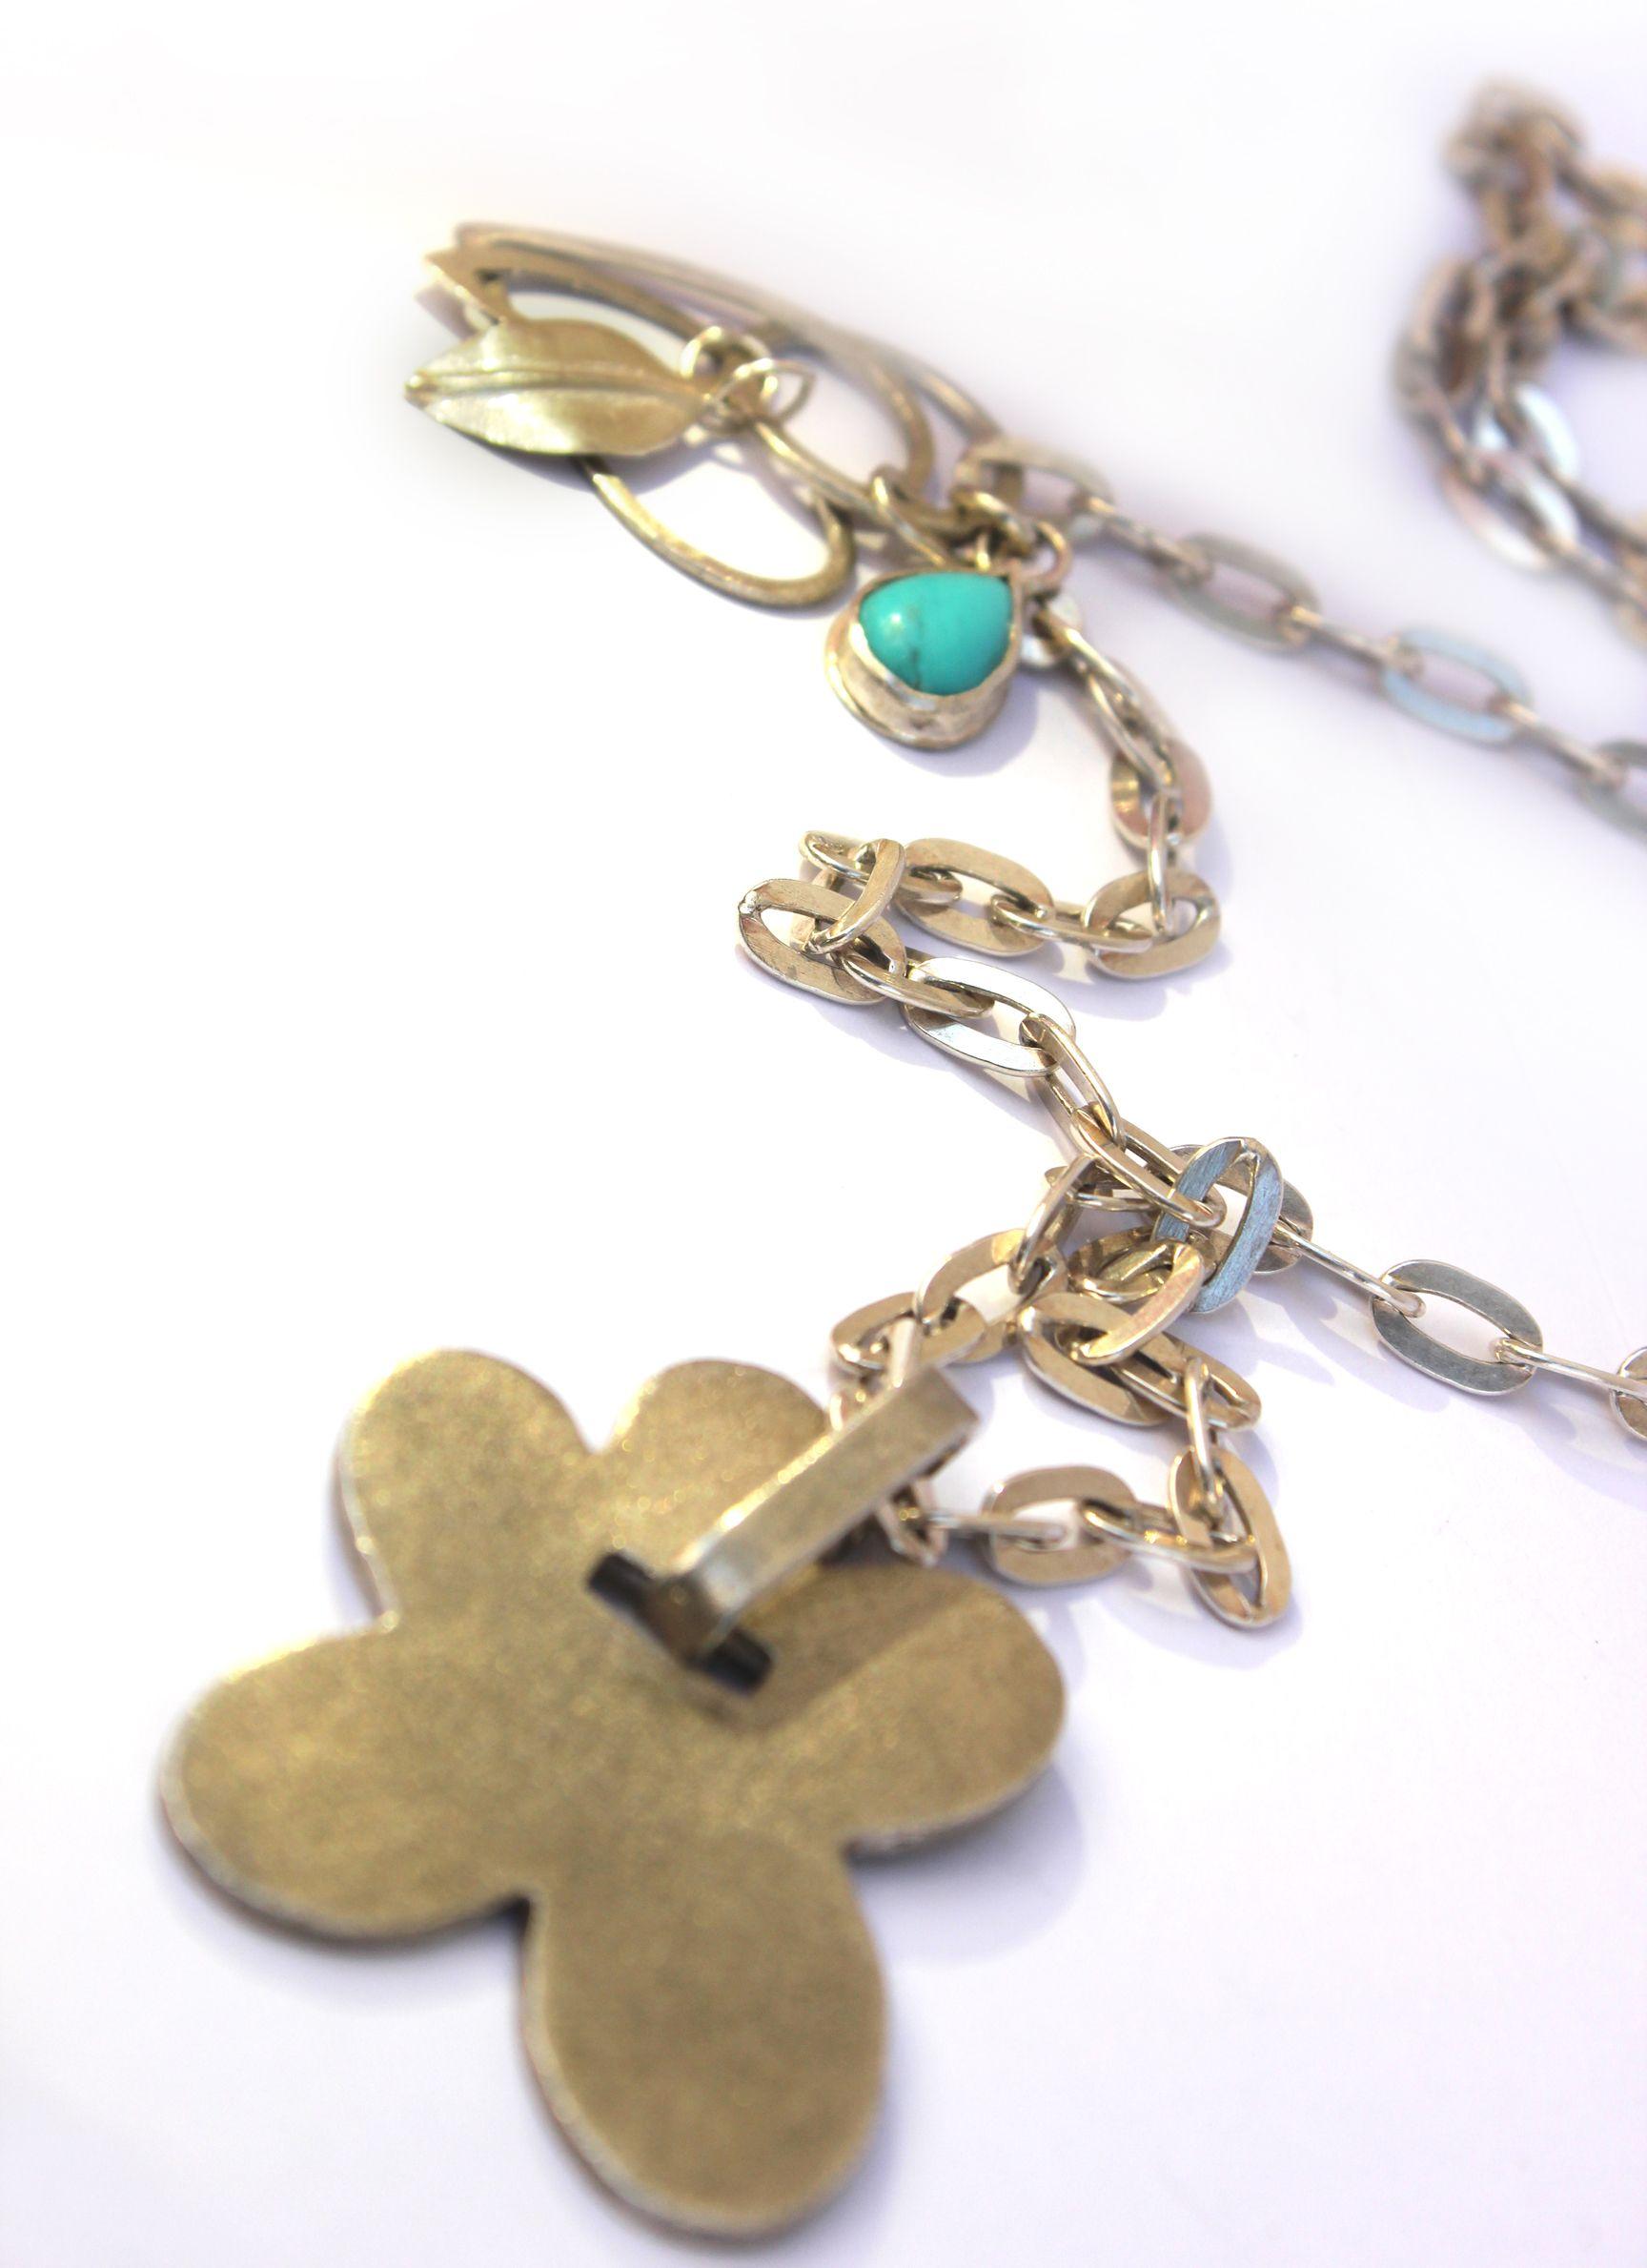 Long Sterling Silver Flower Necklace Designer necklace by Vered